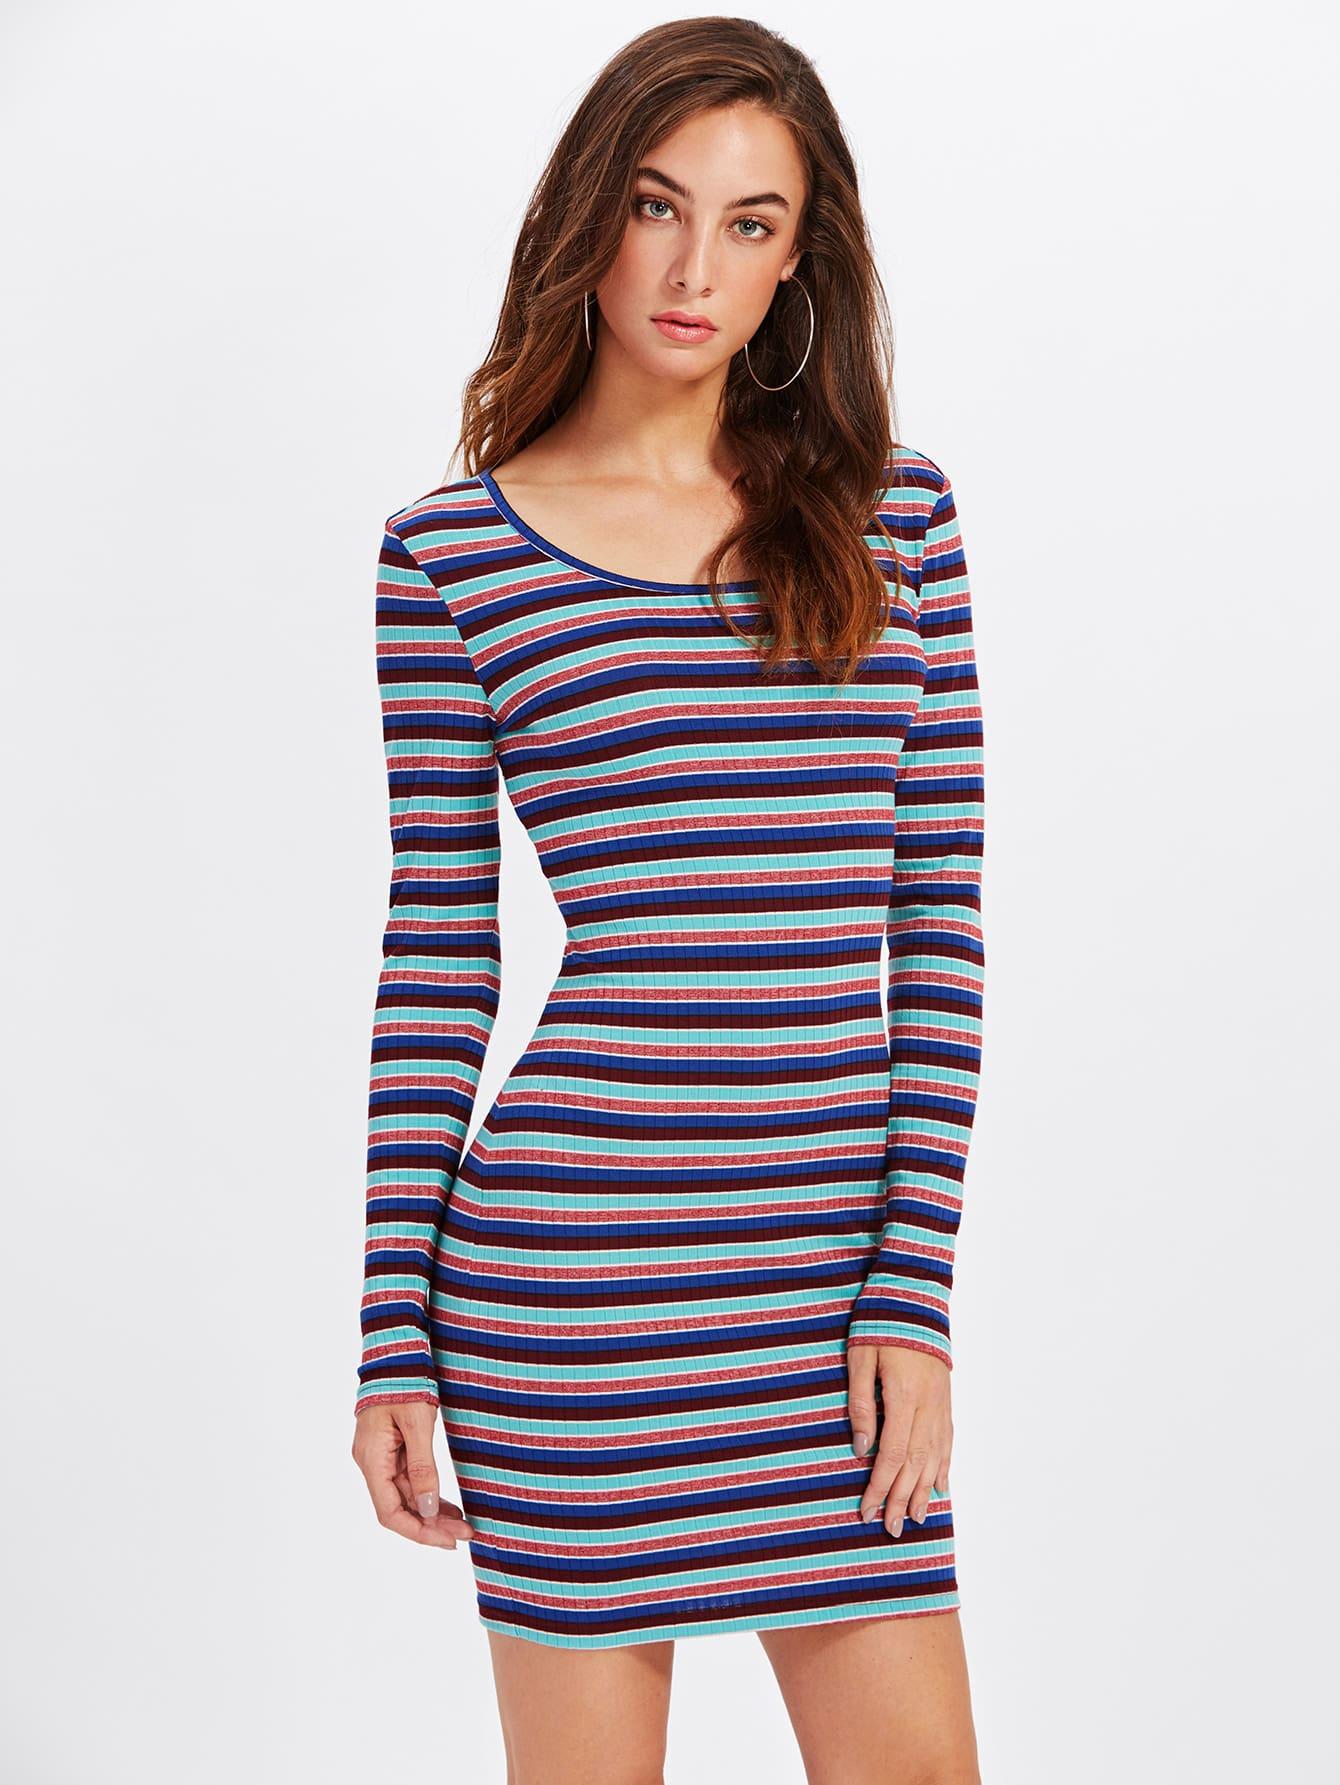 Rib Knit Striped Bodycon Dress dress171016713